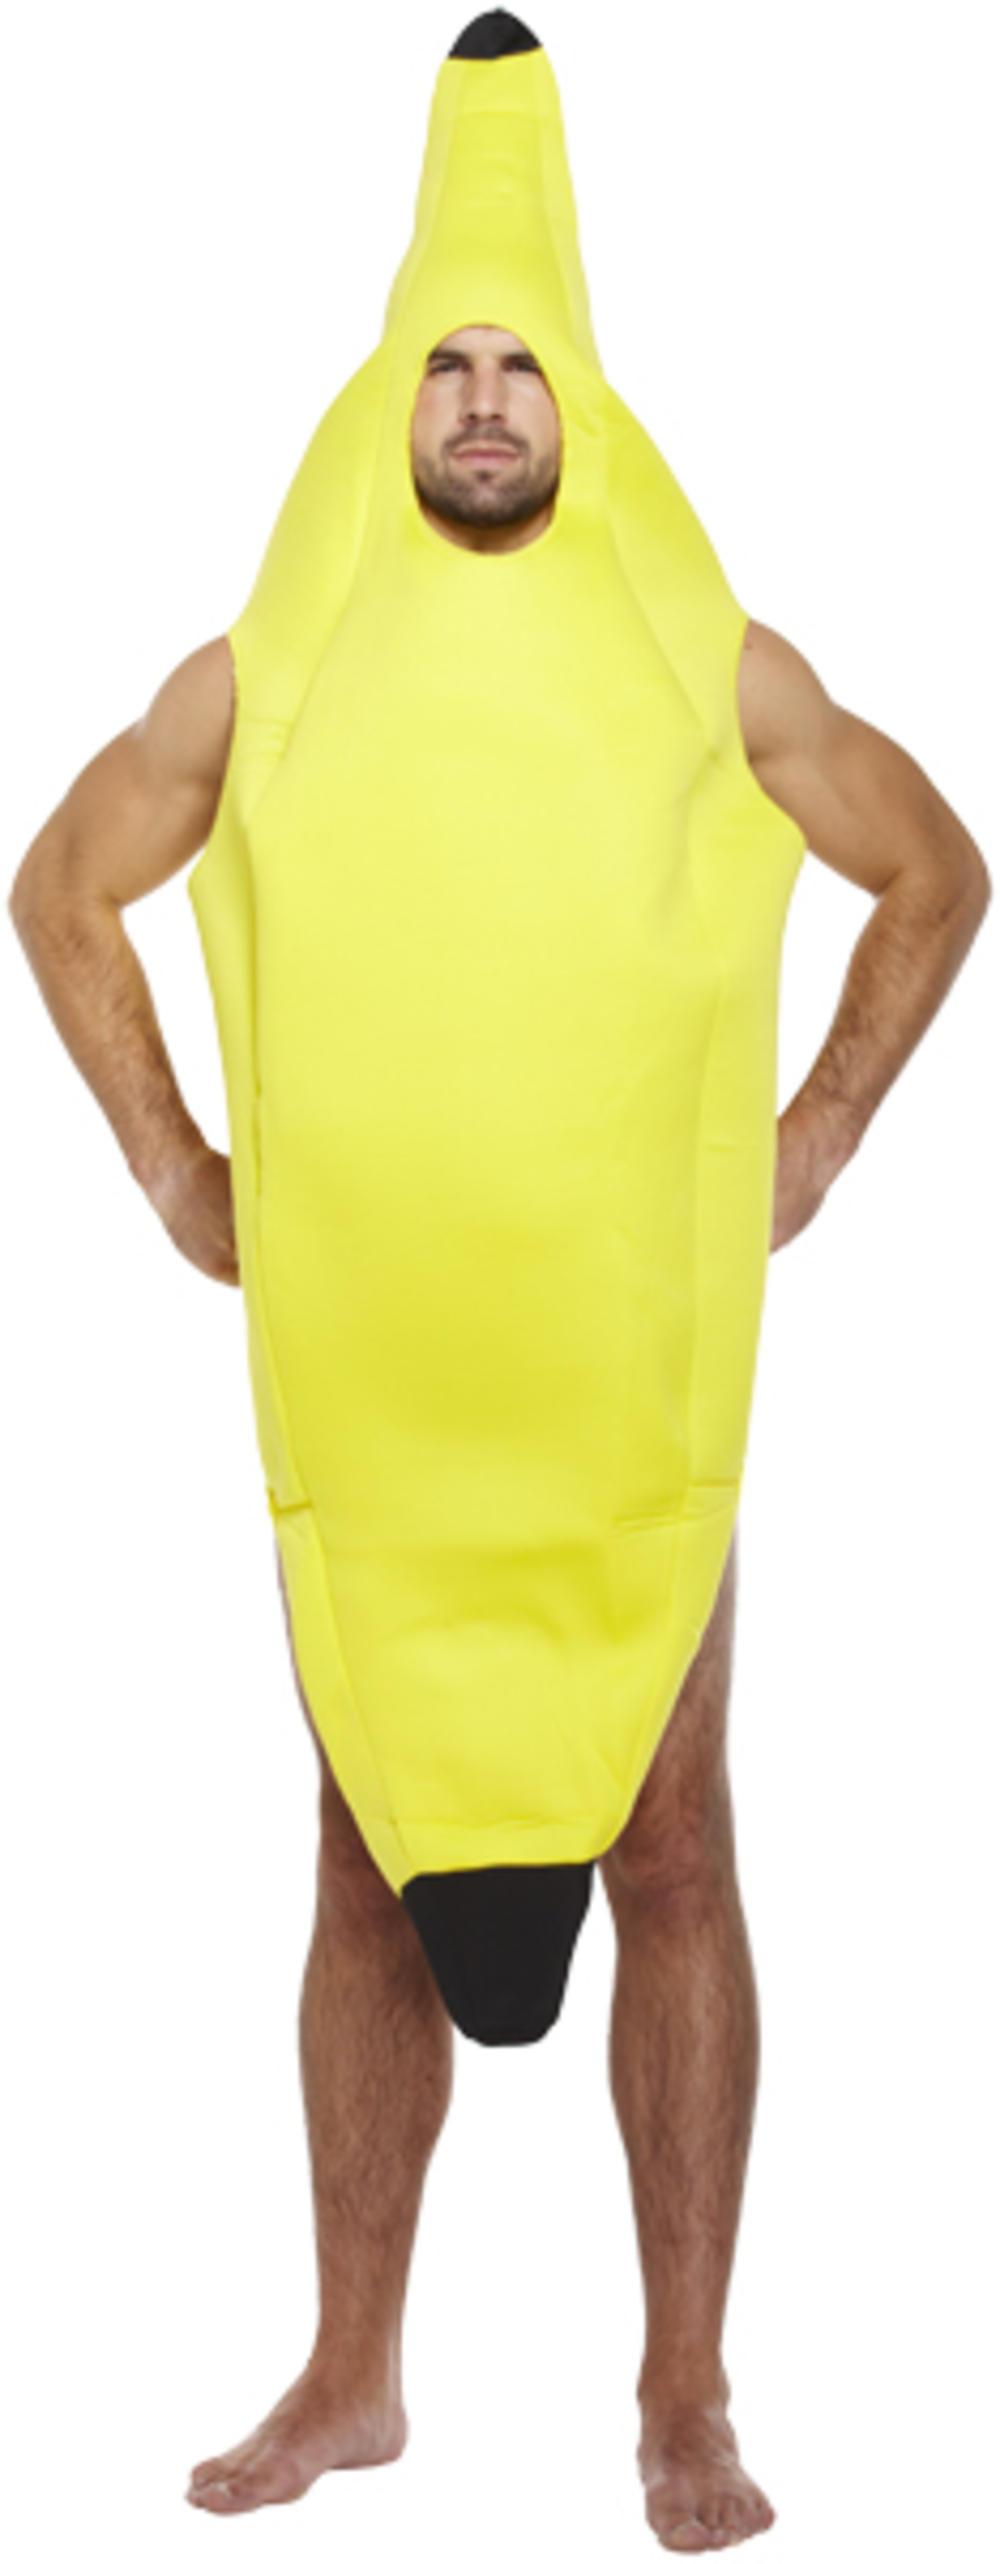 Adults Banana Costume